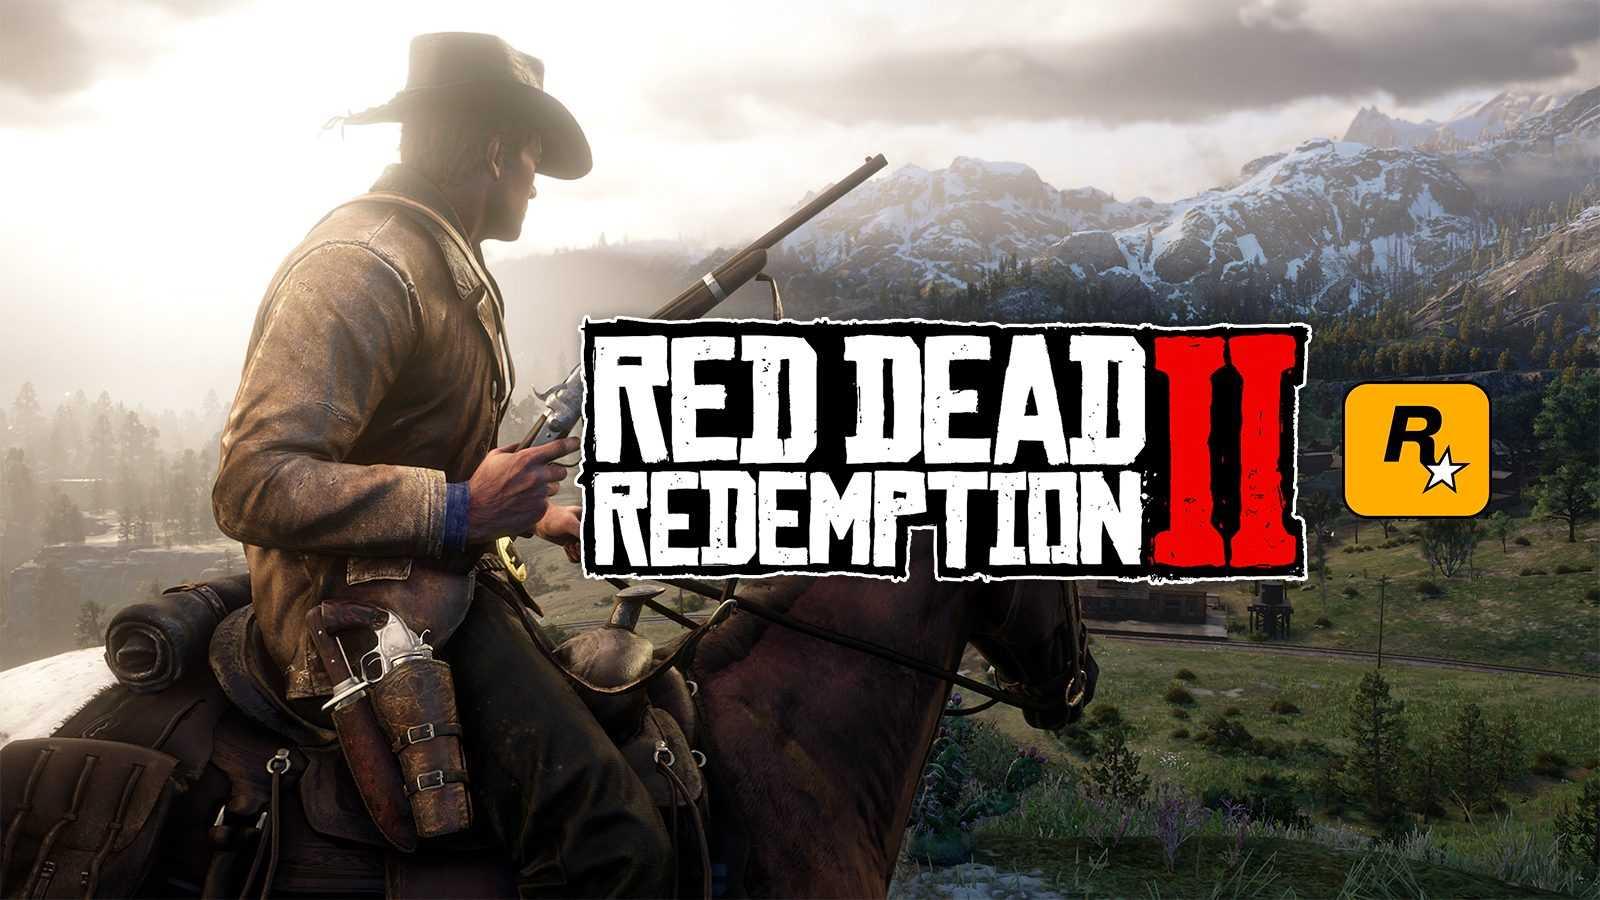 Red Dead Redemption 2: Rockstar Games disponibiliza música oficial do game no Spotify 1